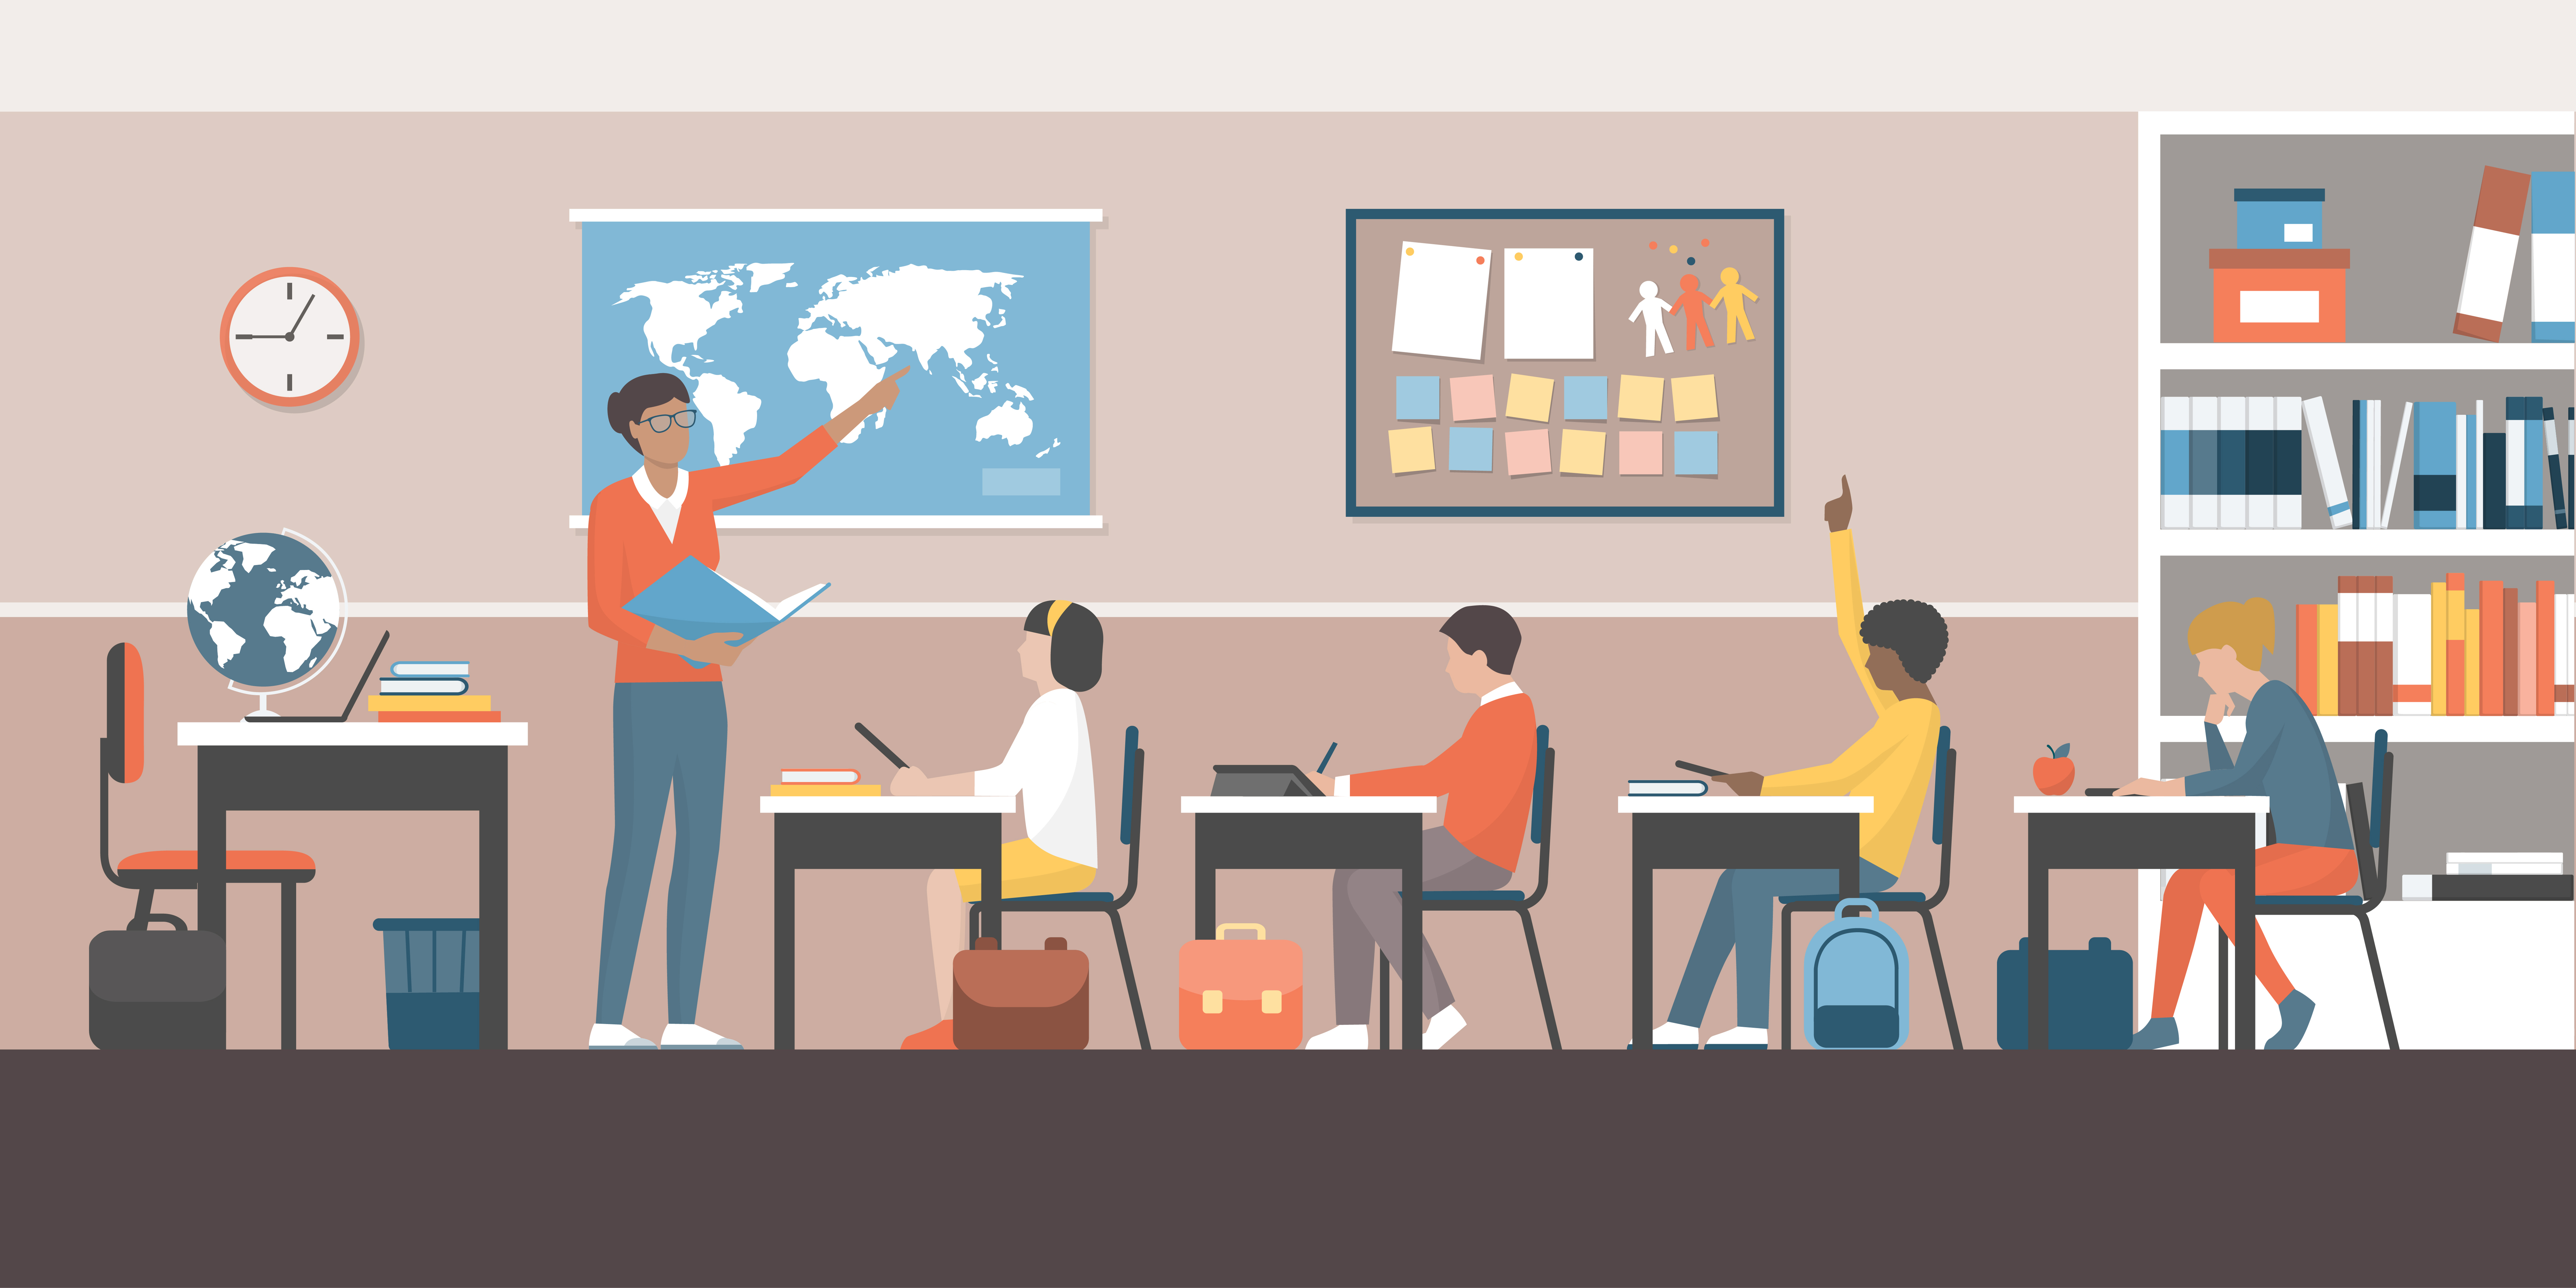 Teacher and students classroom